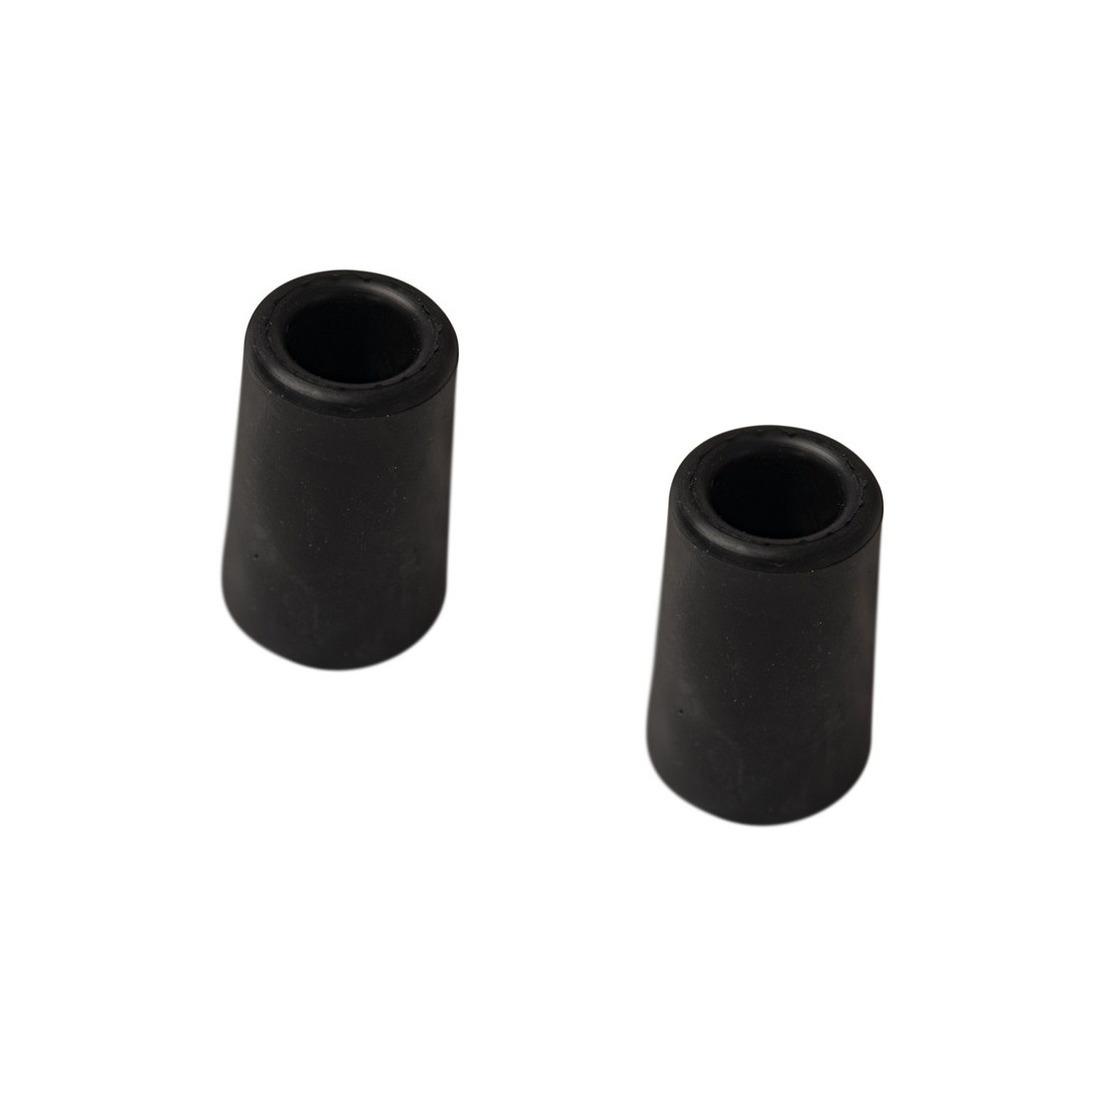 2x stuks deurstopper - deurbuffer rubber zwart 60 mm